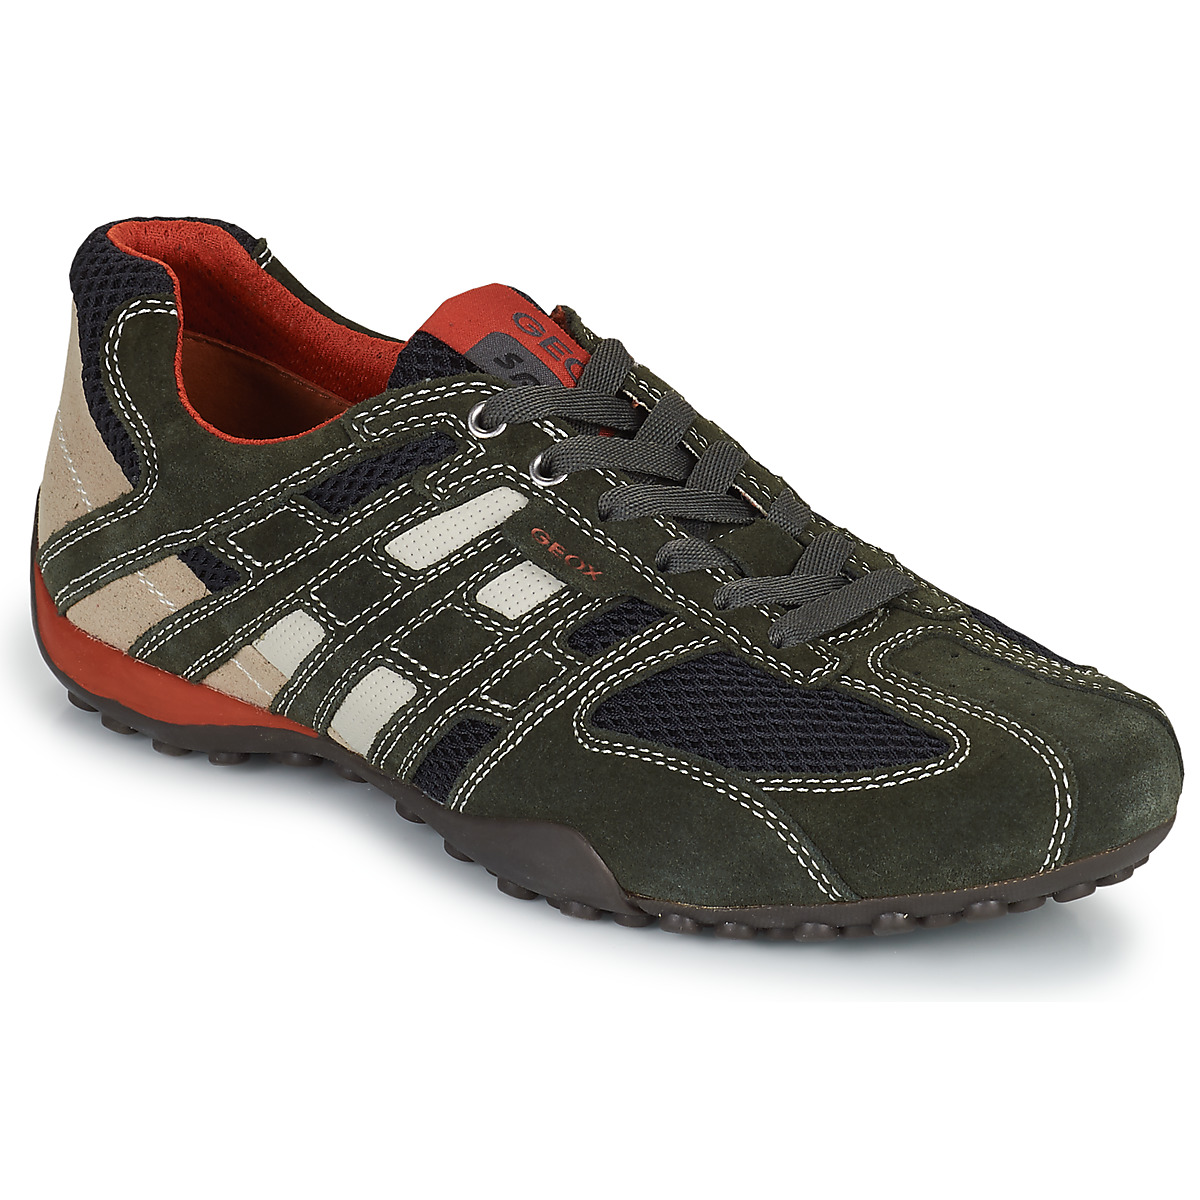 Geox SNAKE Grau - Kostenloser Versand bei Spartoode ! - Schuhe Sneaker Low Herren 79,99 €